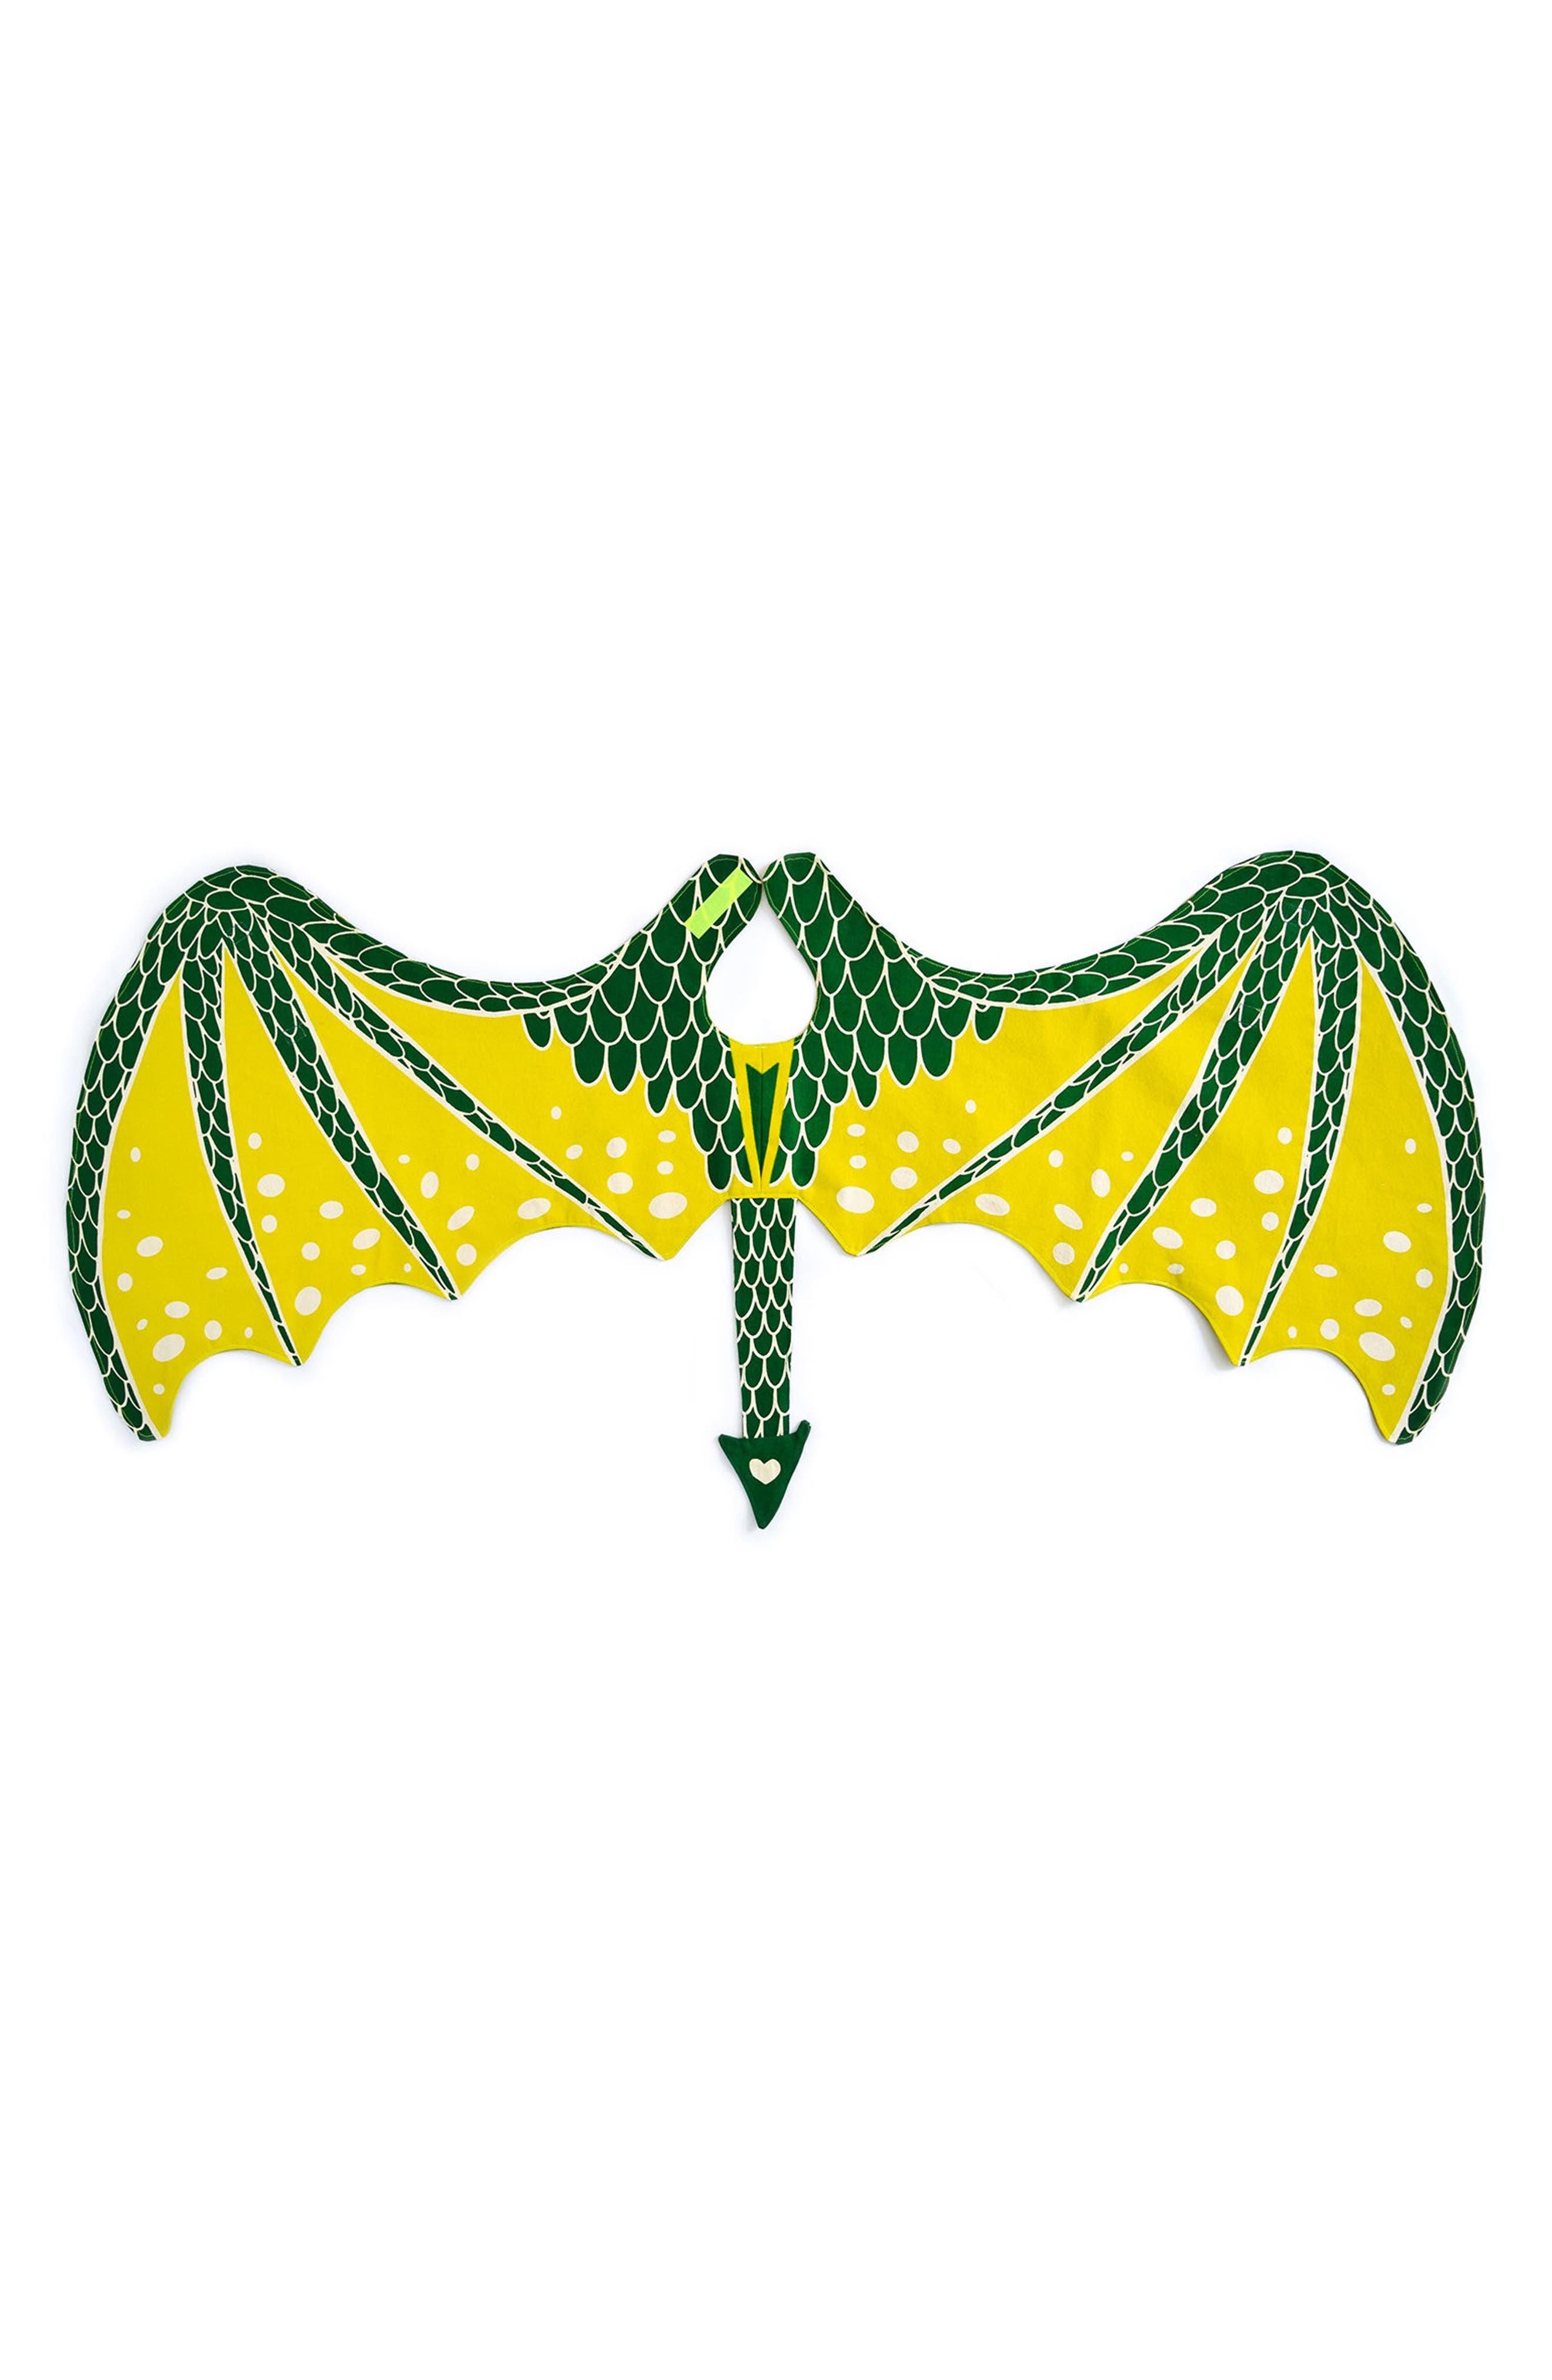 Toddler Lovelane Dragon Wings  Hat Costume Set